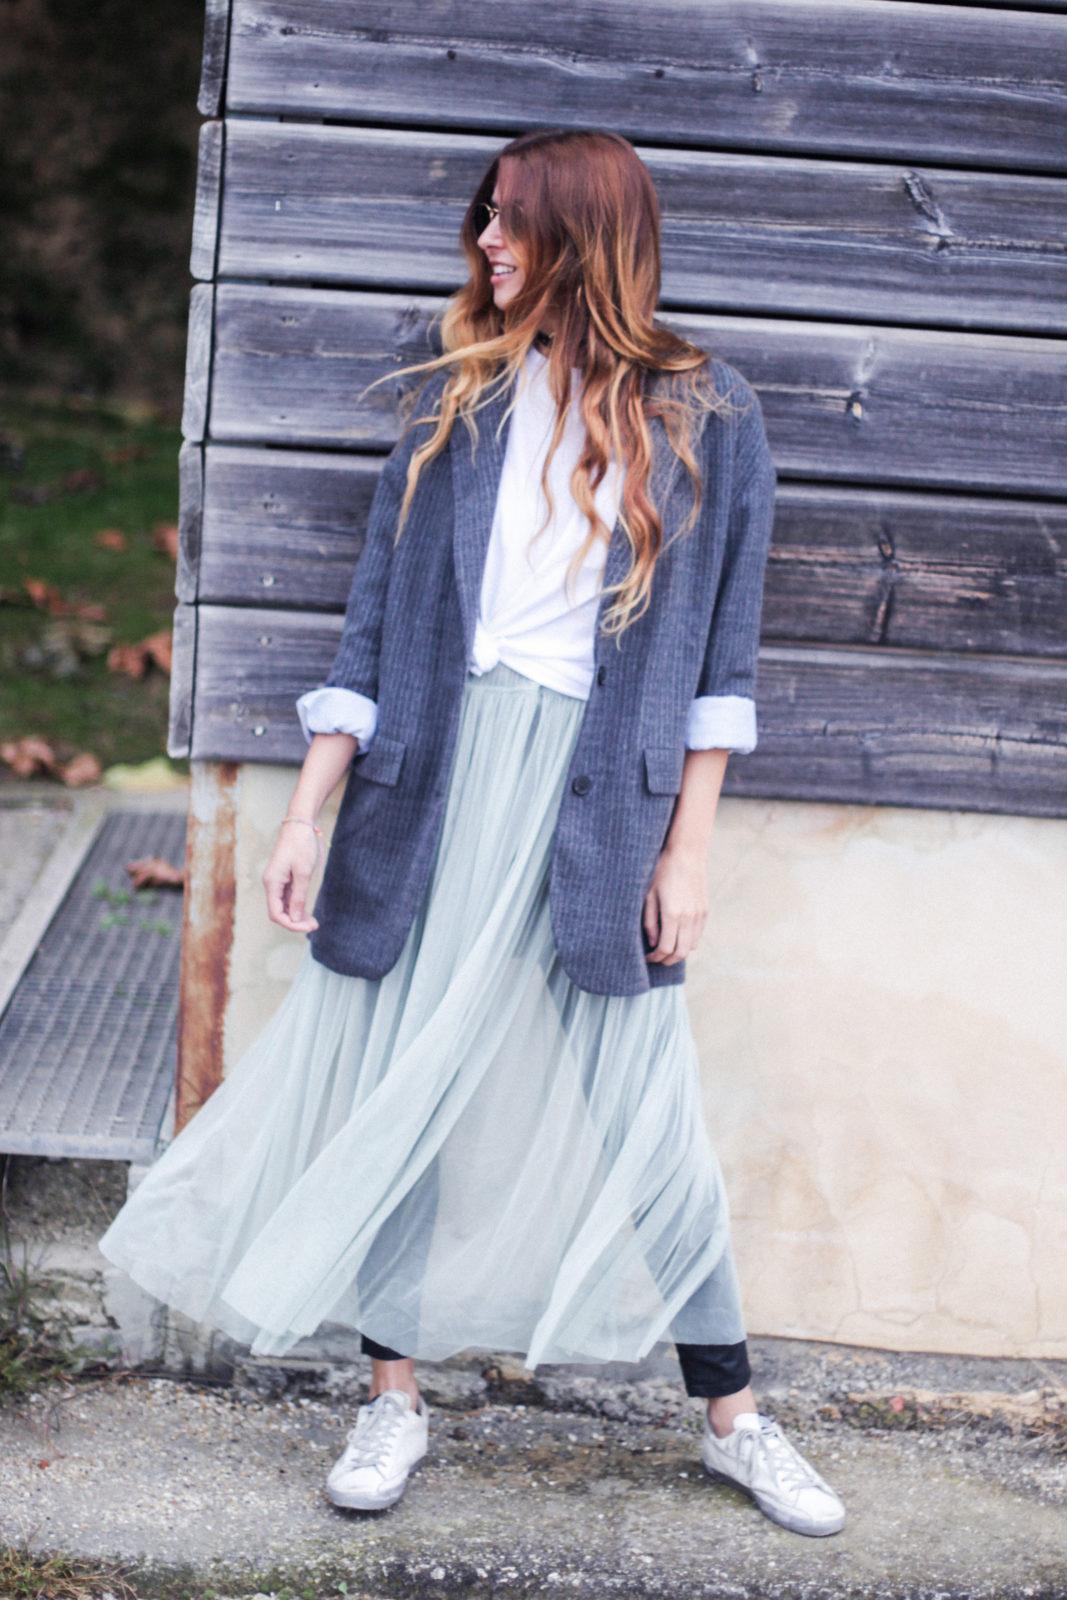 vestido_de_tul_sobre_pantalon_estilo_bailarina_blazer_oversize_pendientes_de_aros_choker_tendencias_trends_fall_2016_street_style_donkeycool-31